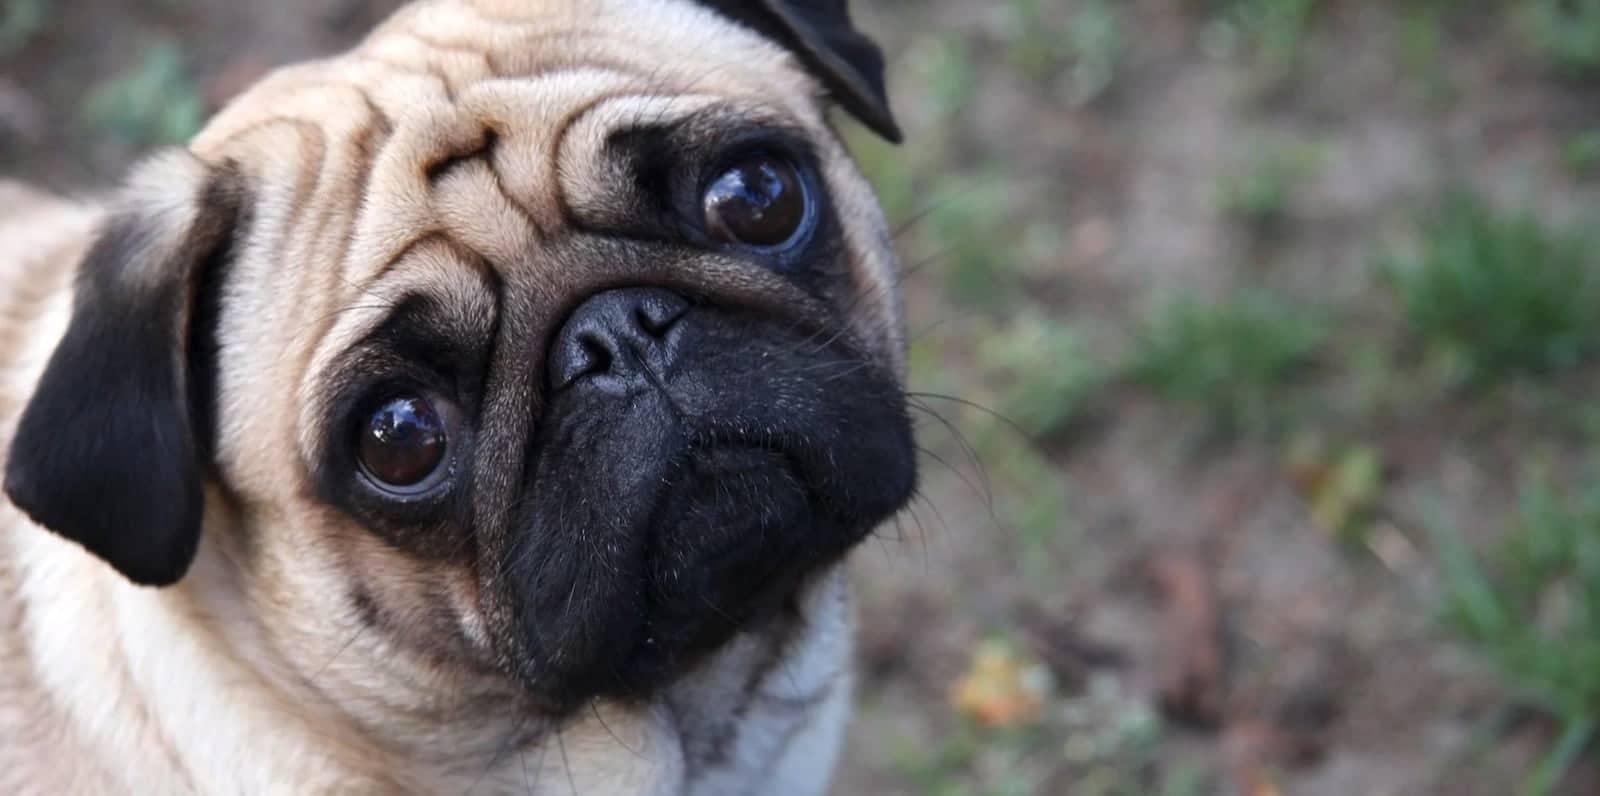 What does Pathos mean -Pathos Definition - Pathos Examples - Aristotle Rhetoric - Puppy